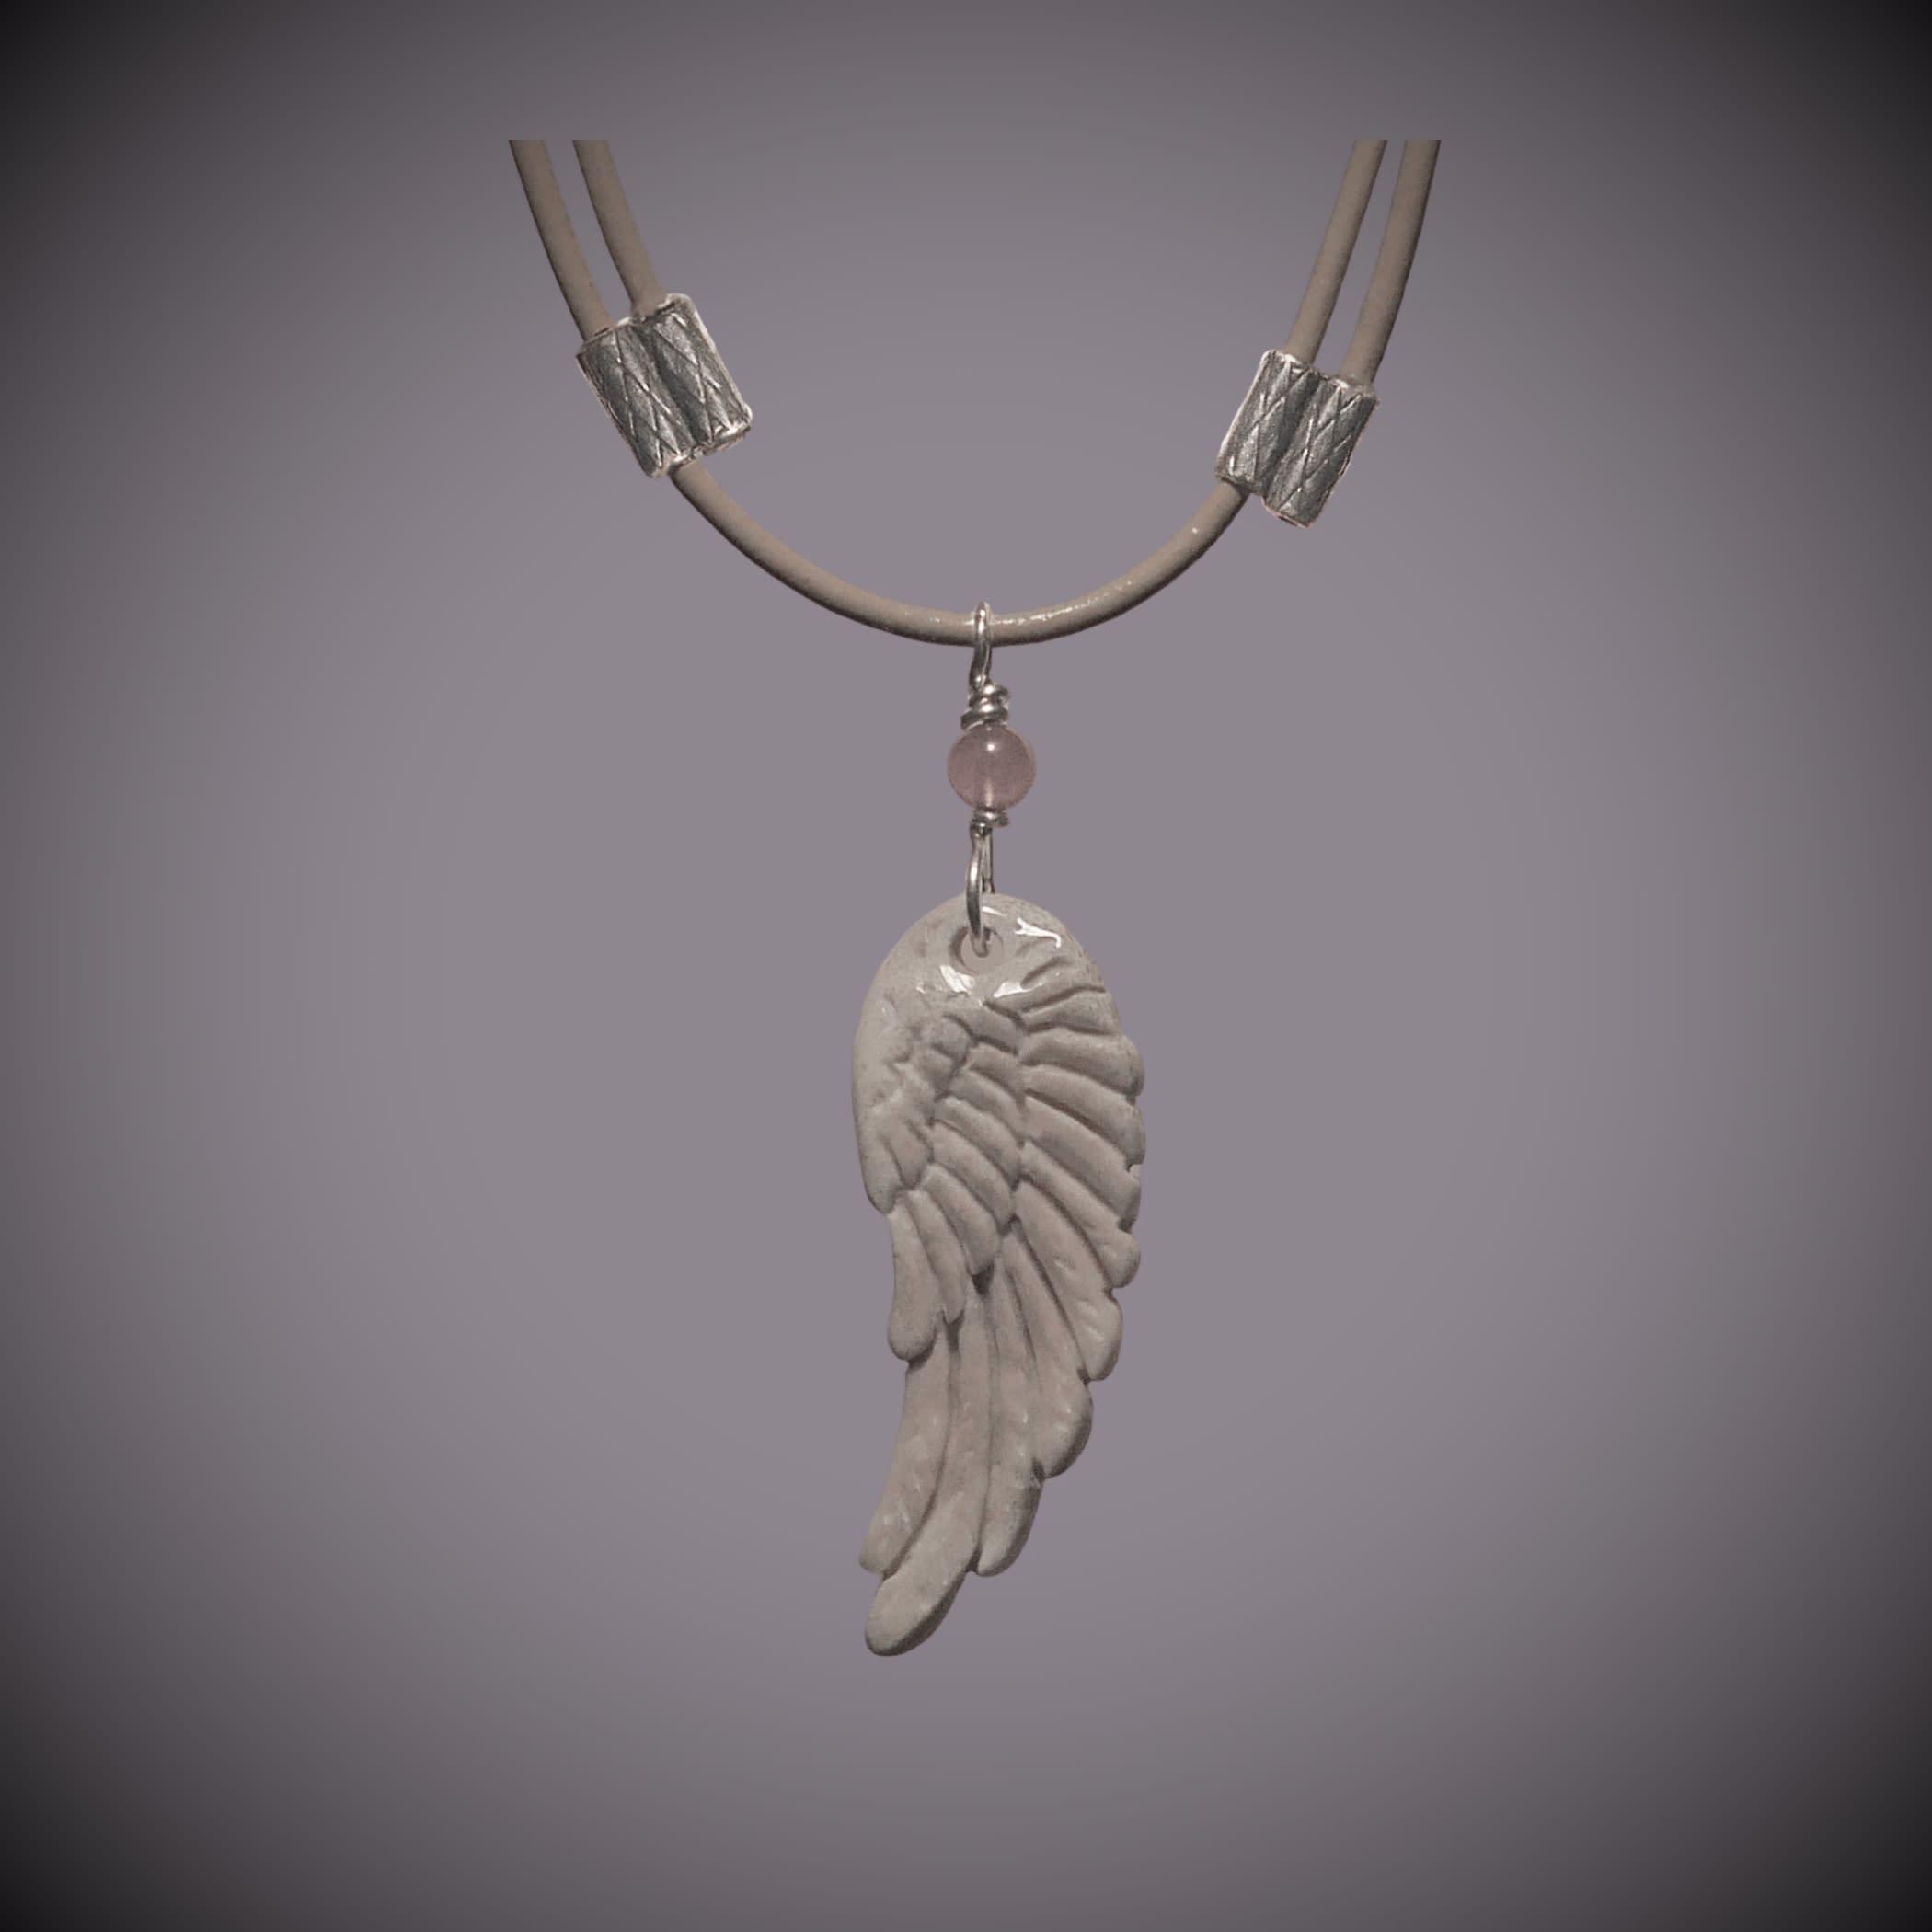 Angel wing light back 3  wondershare o1ubhq